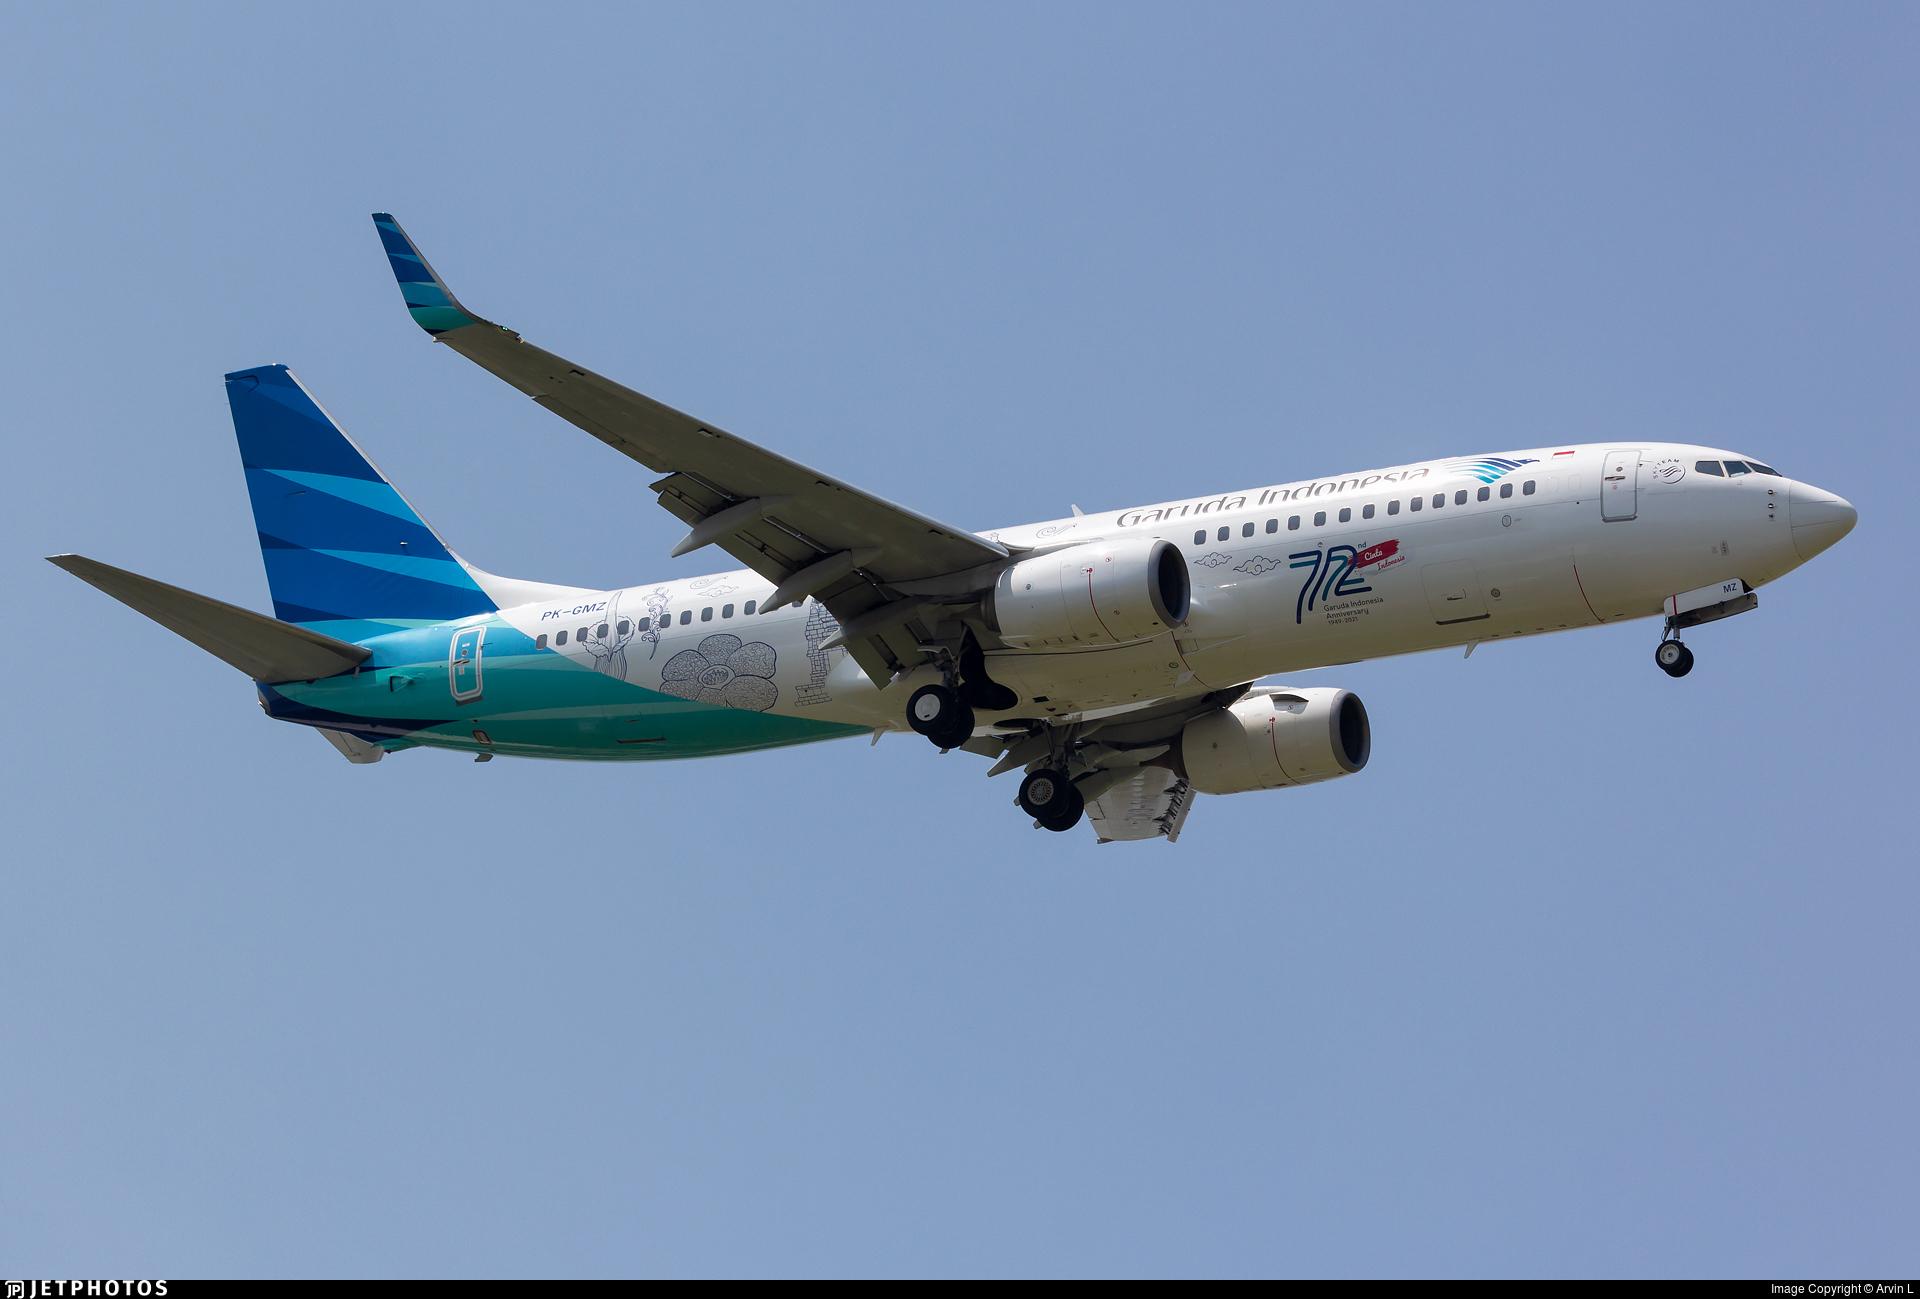 PK-GMZ - Boeing 737-8U3 - Garuda Indonesia